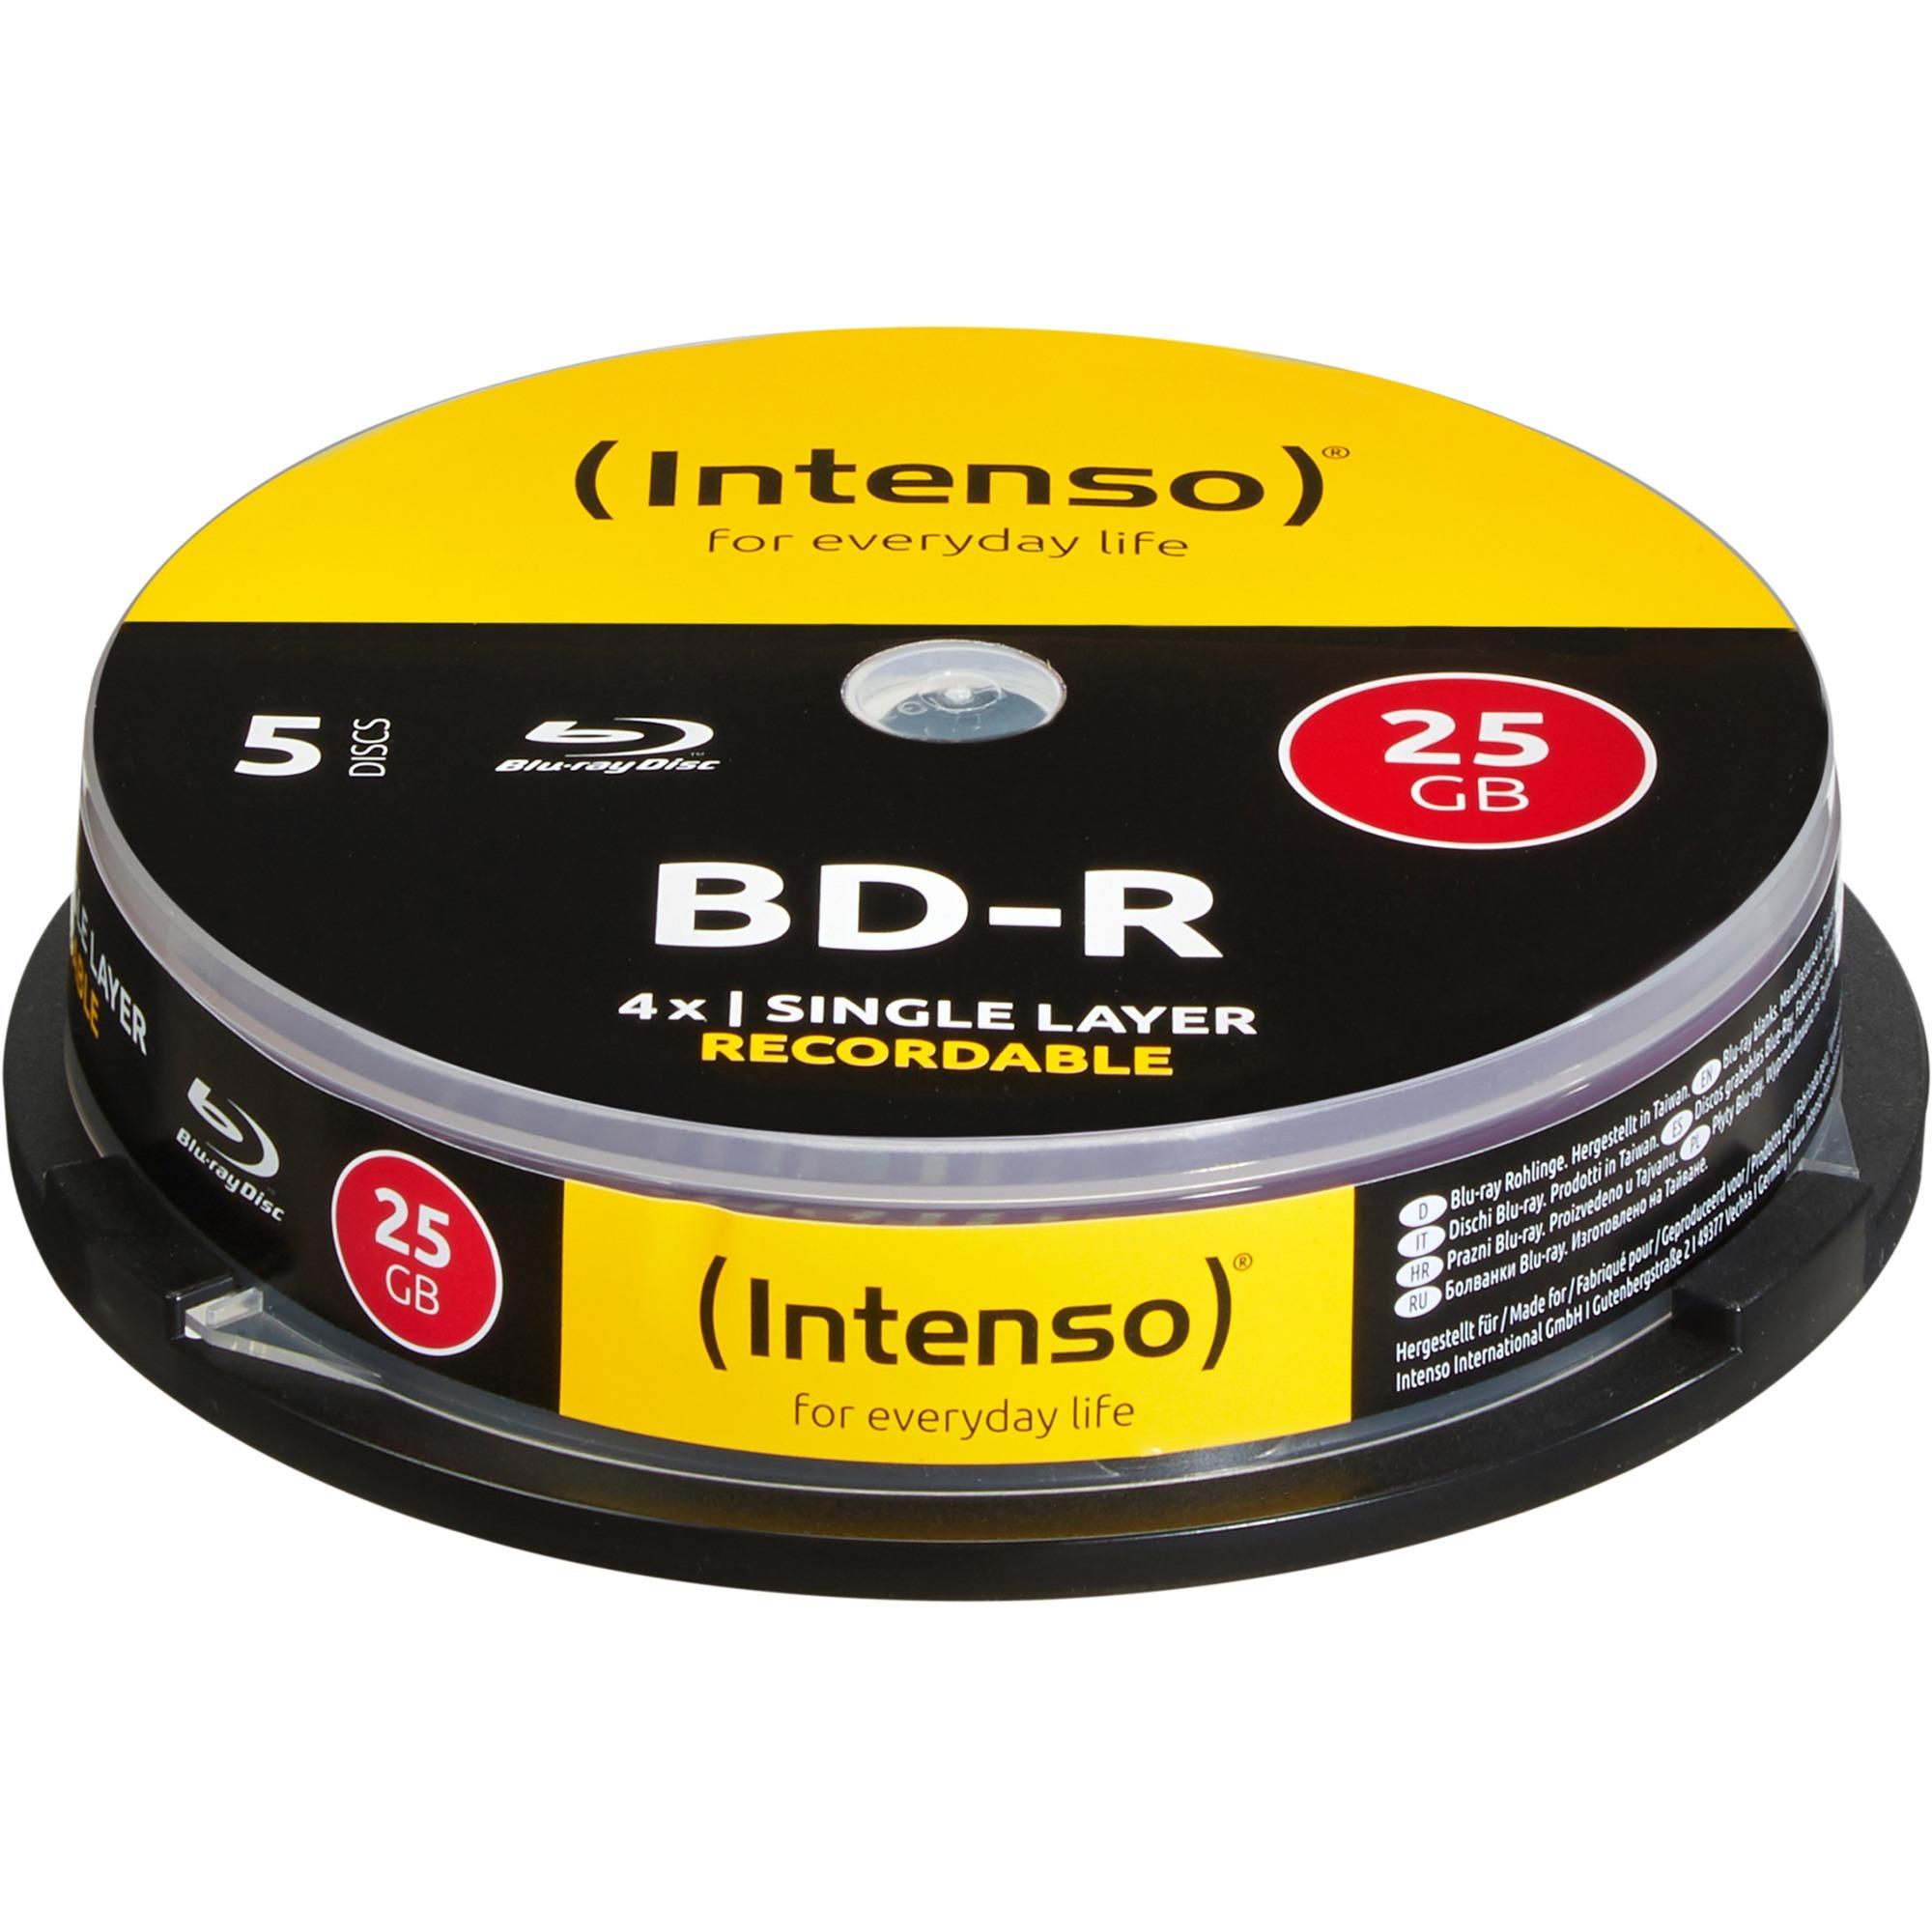 5001111-25gb-bd-r-5pcs-readwrite-blu-ray-medie-bd-blu-ray-diske